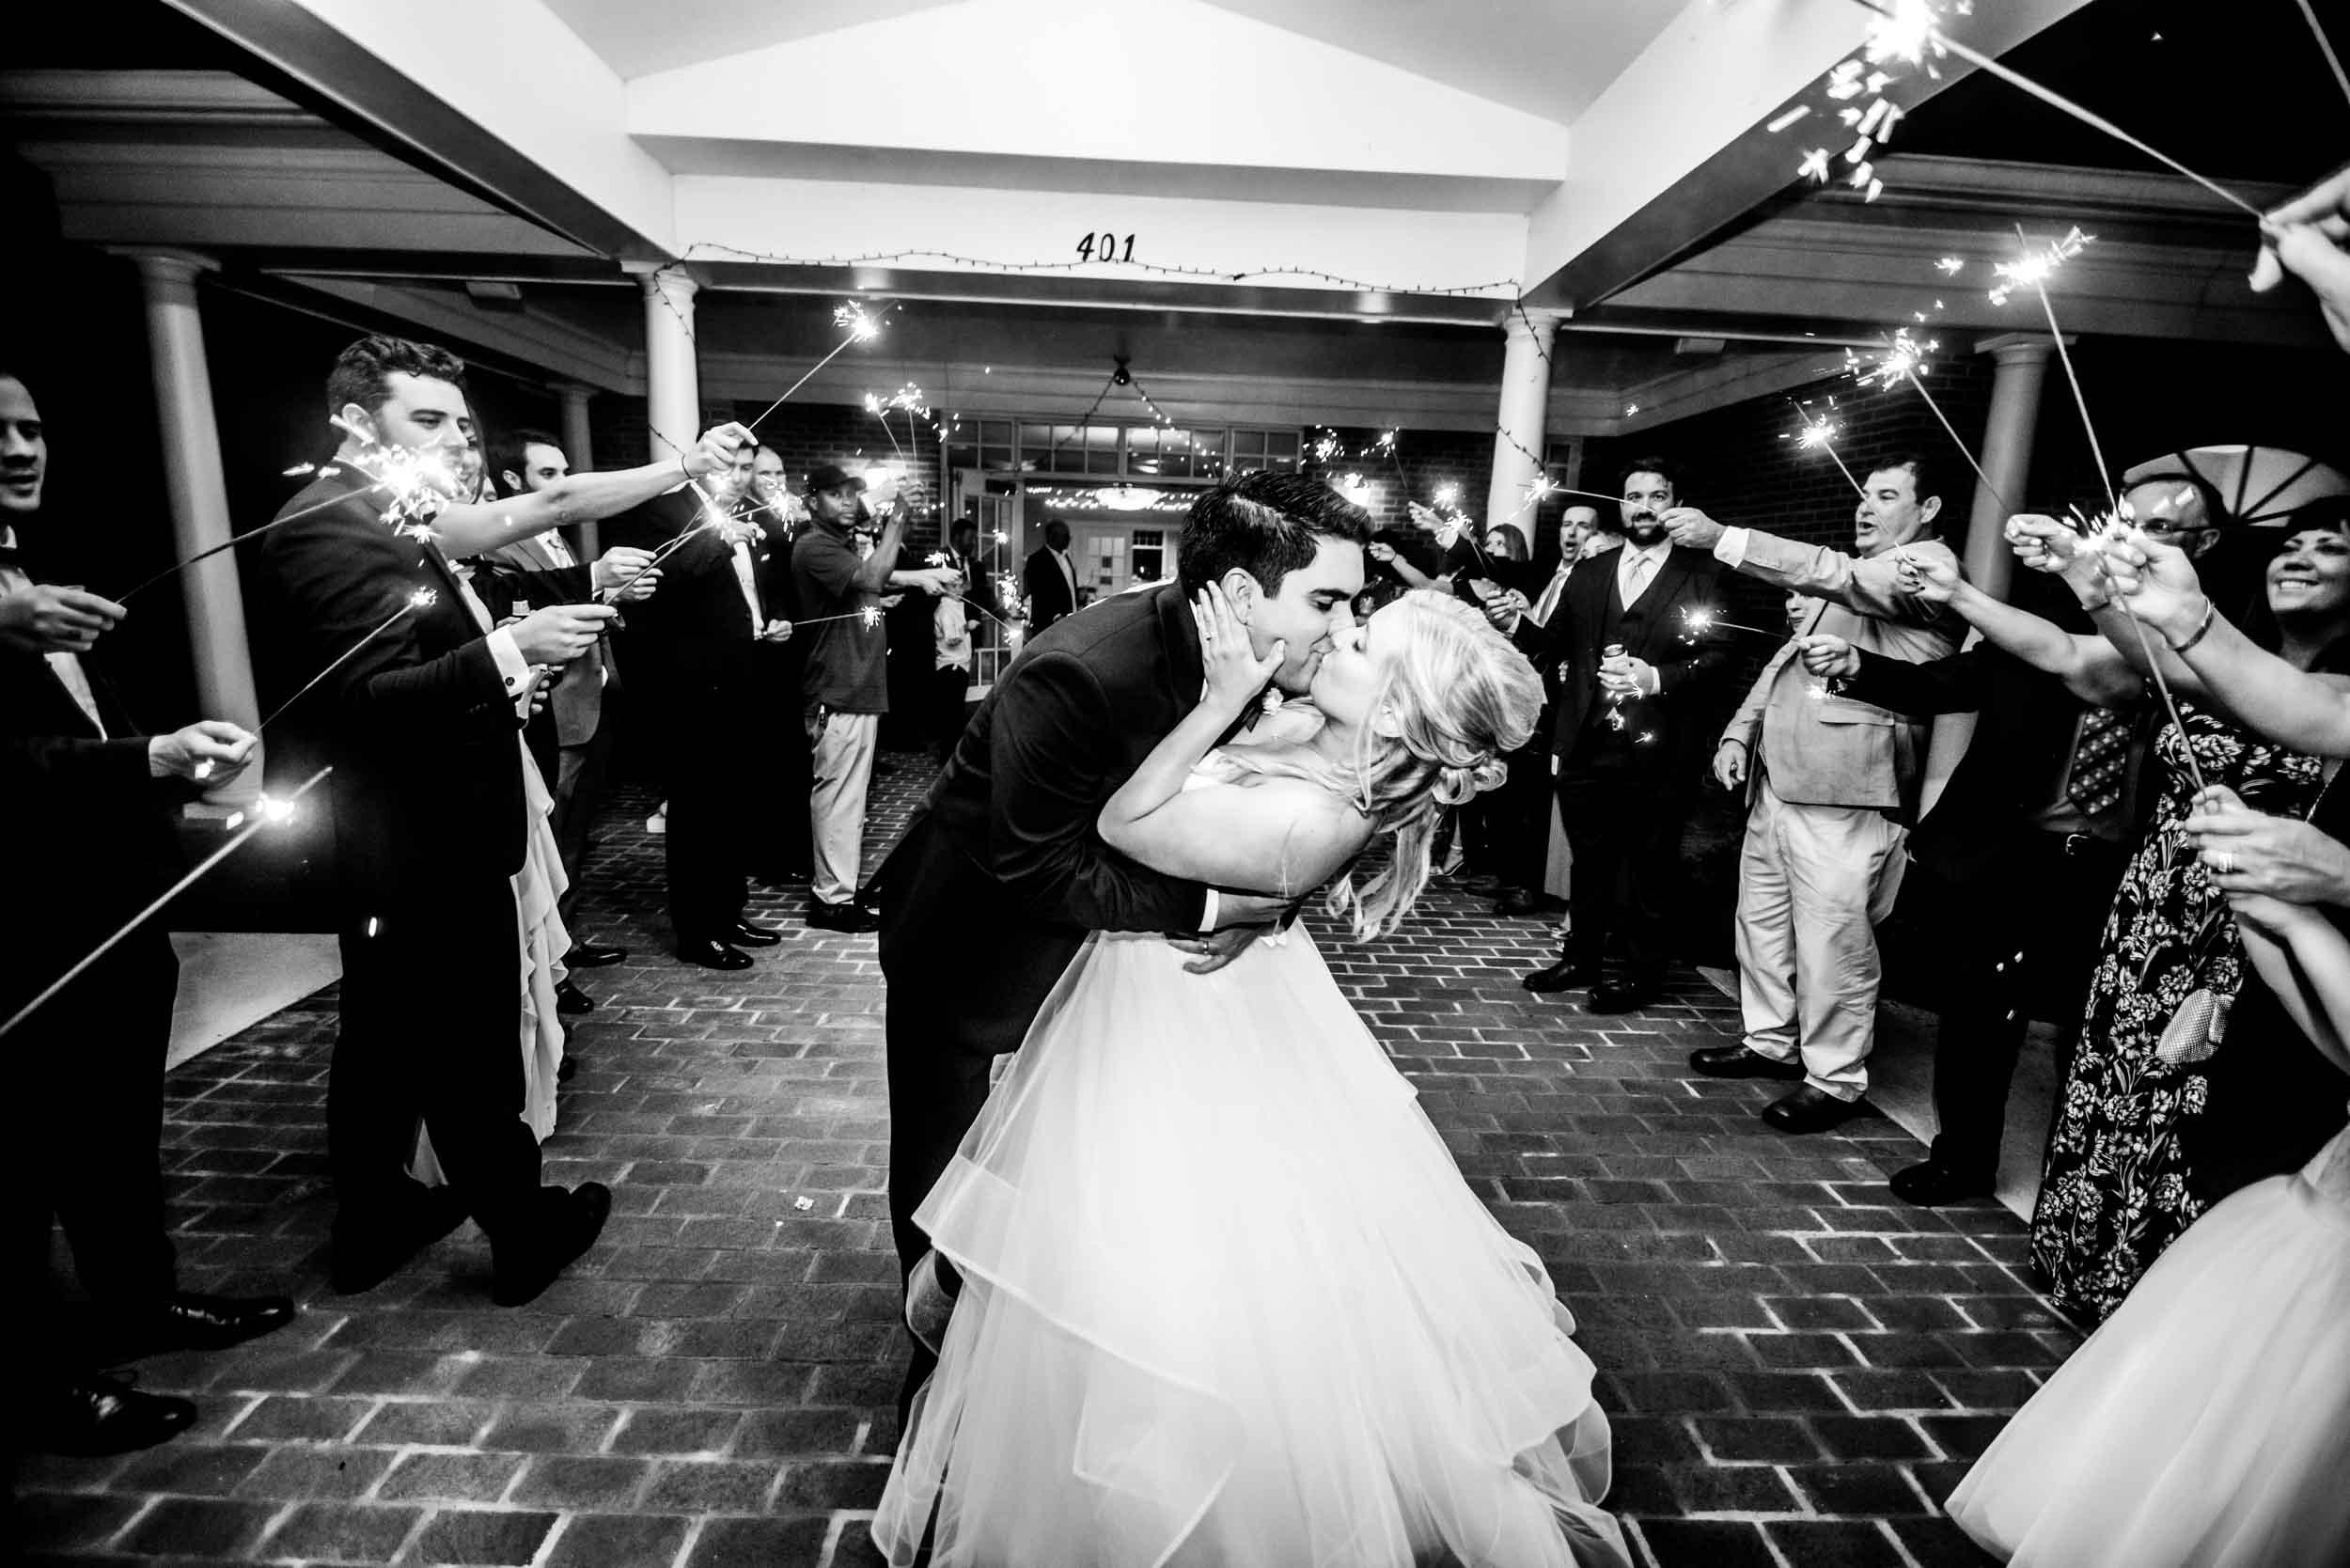 dc+metro+wedding+photographer+vadym+guliuk+photography+wedding+sparkler+exit-2021.jpg